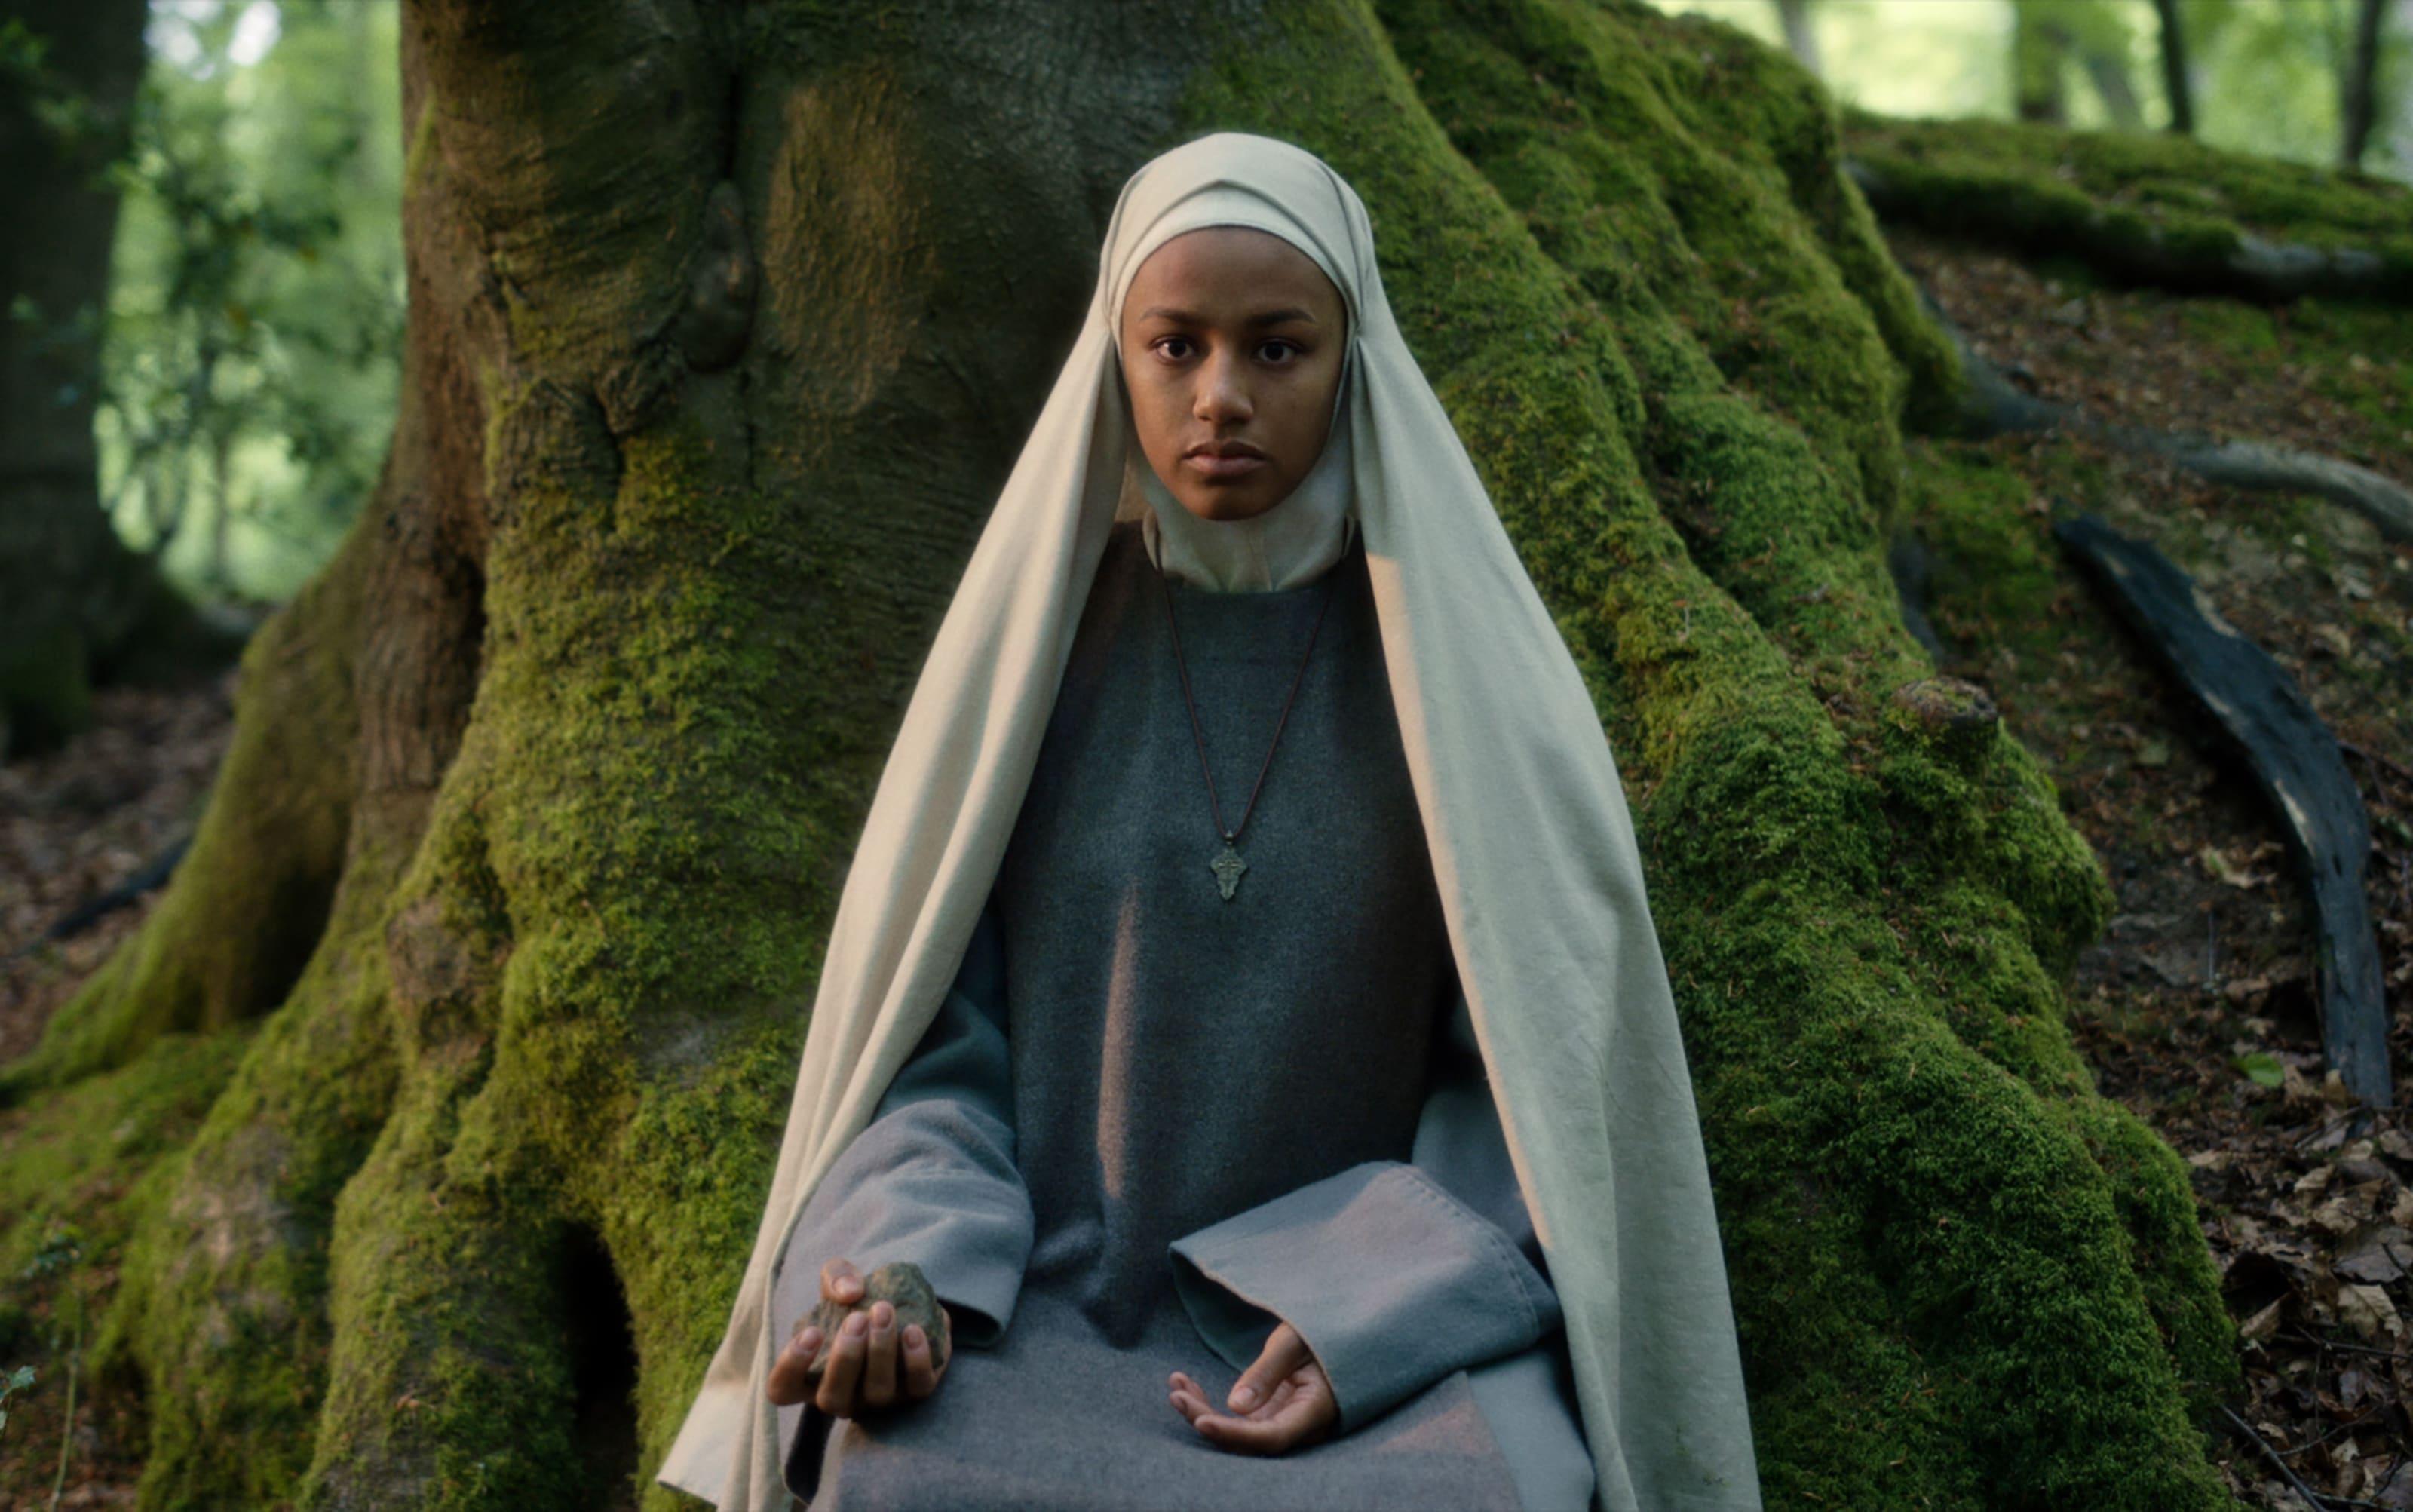 Shalom Brune-Franklin in Netflix's Cursed